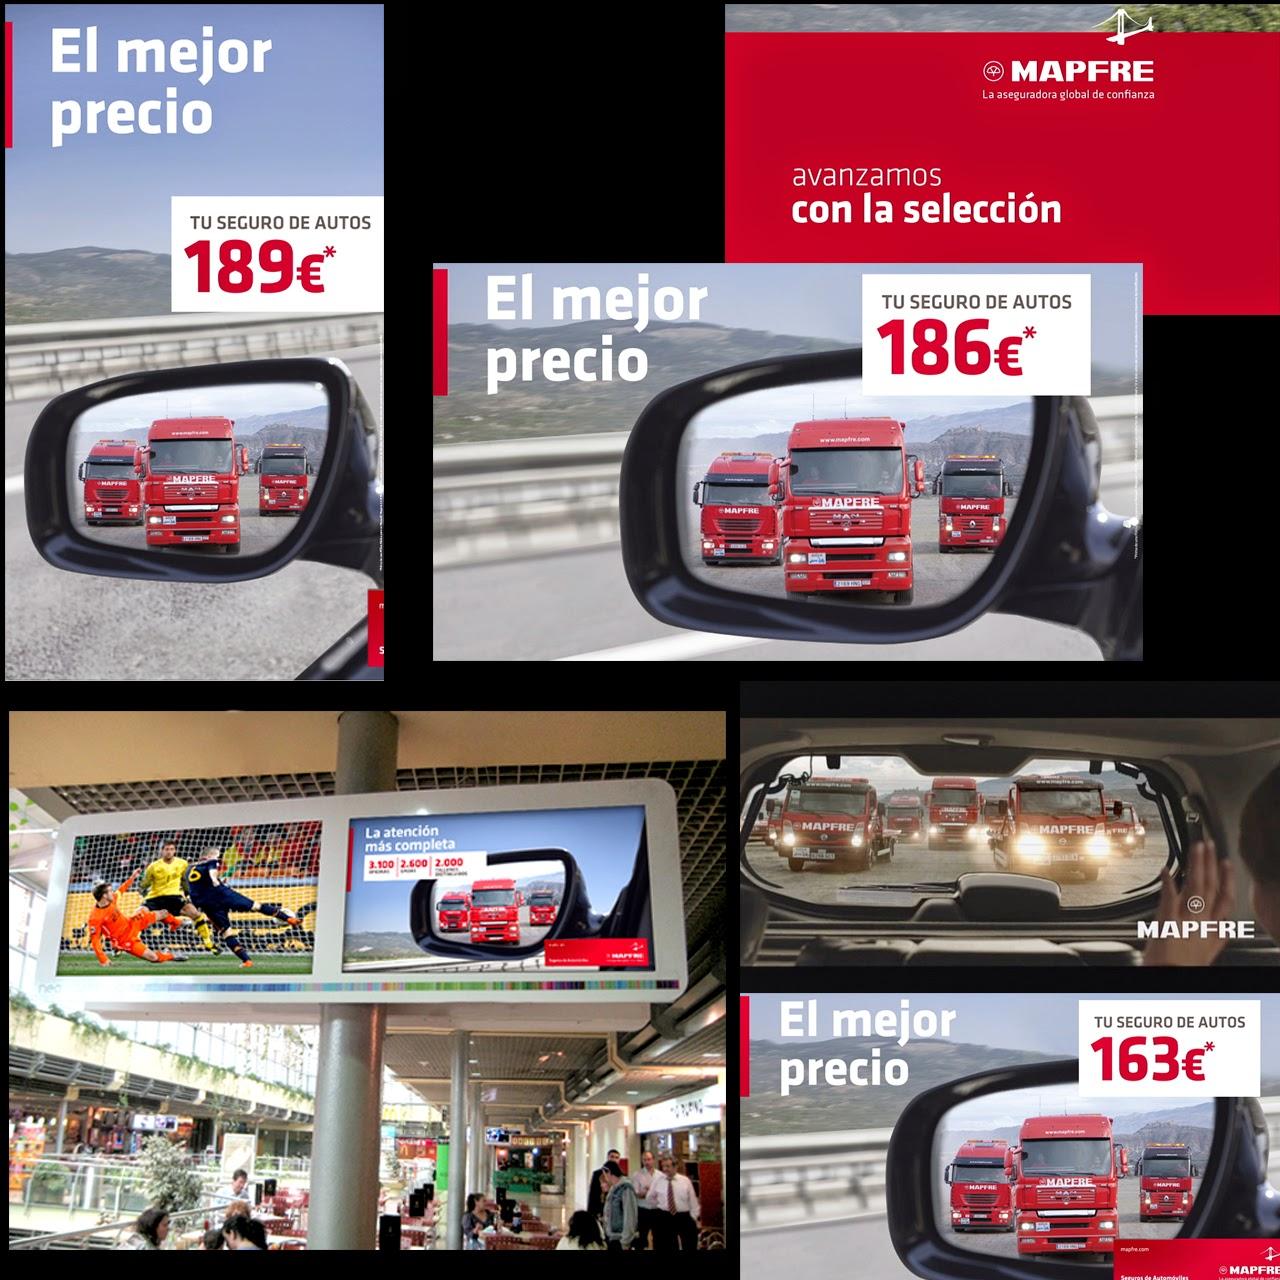 Mapfre Neo Advertising